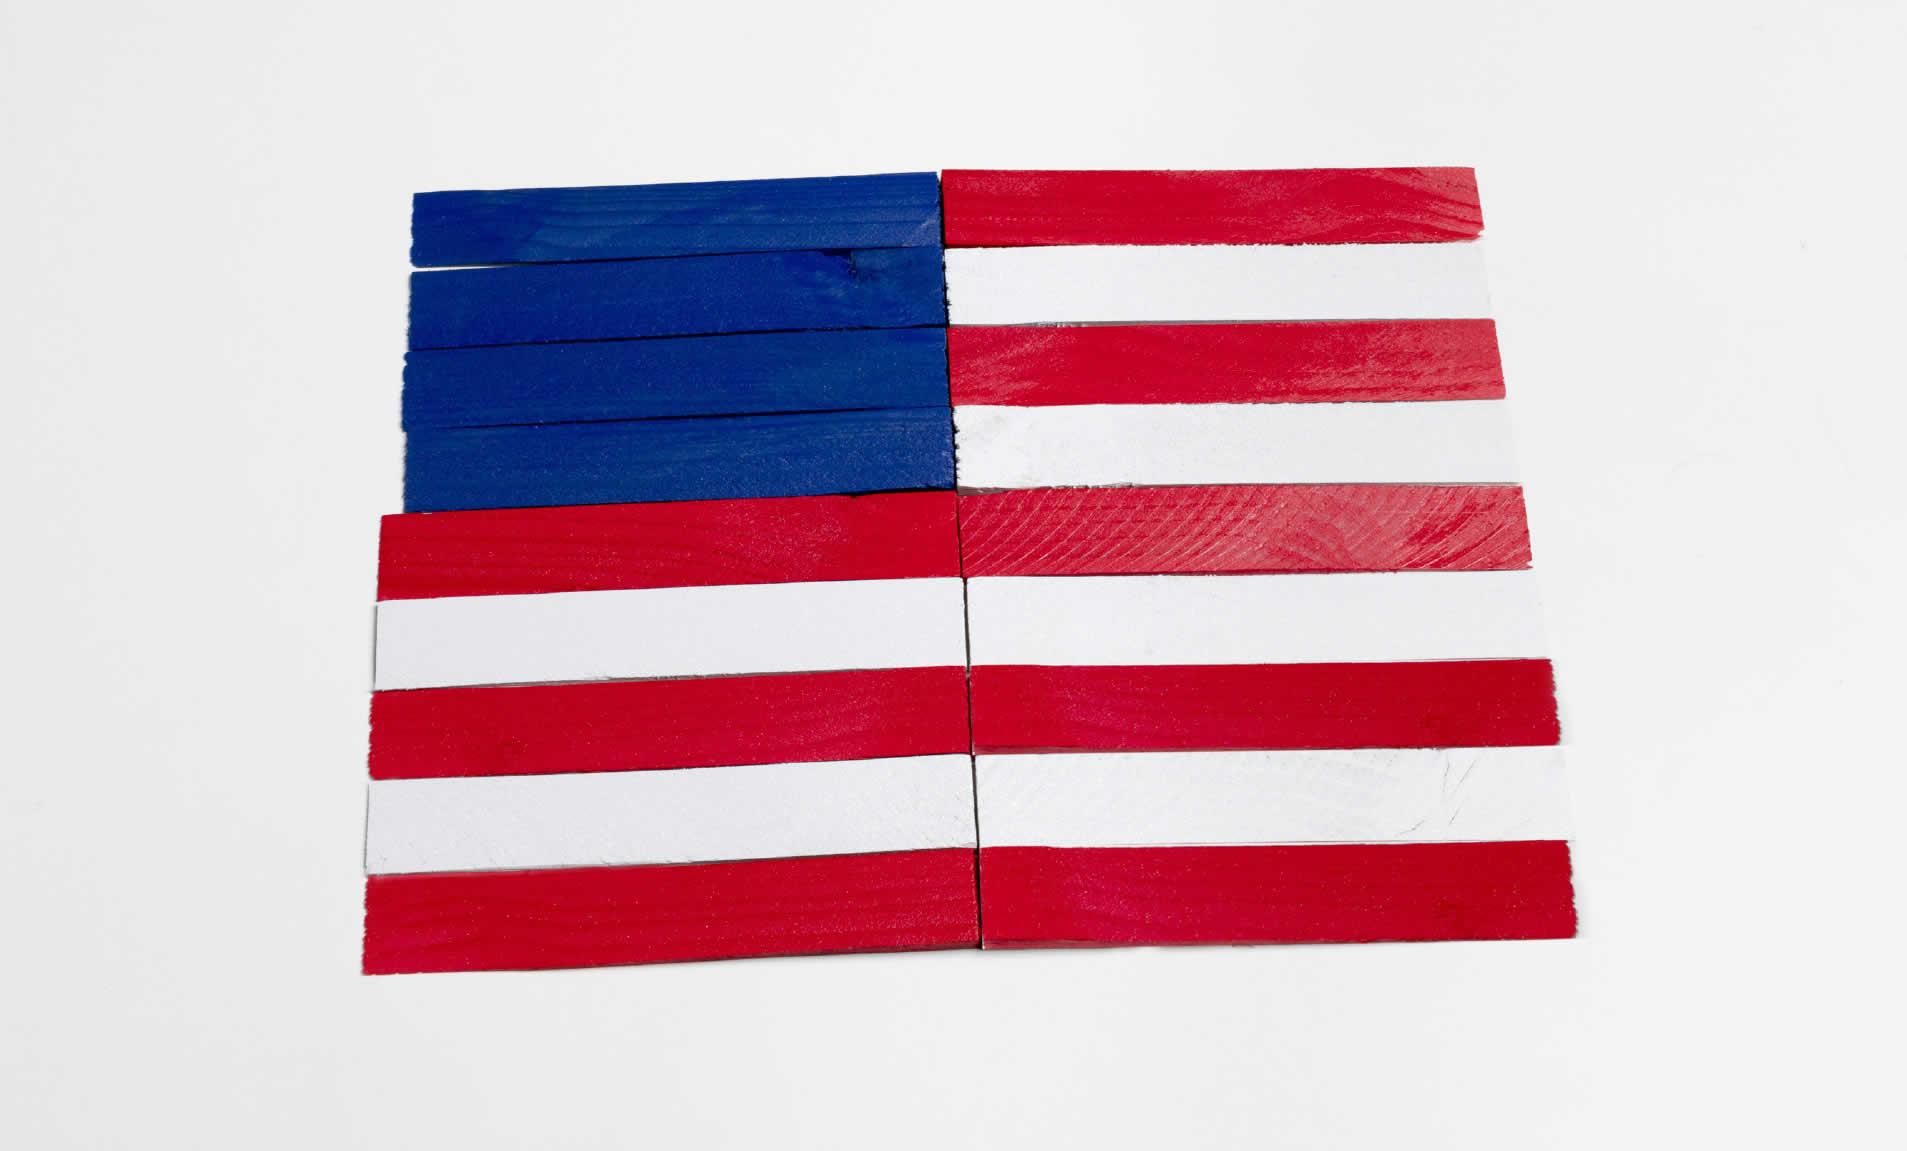 diy patriotic flag crafting